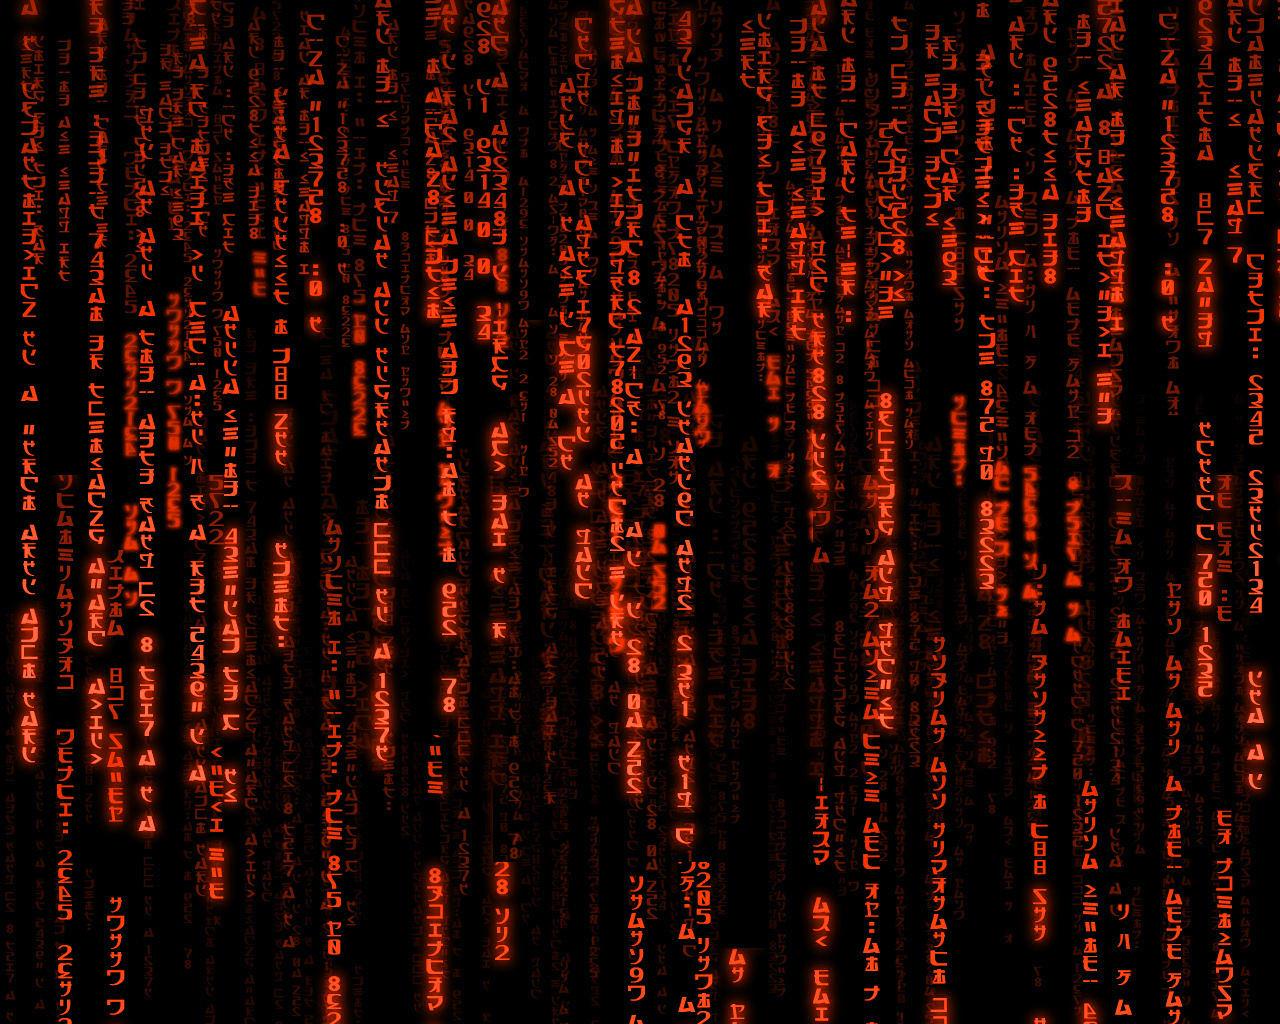 red matrix wallpaper moving - photo #6